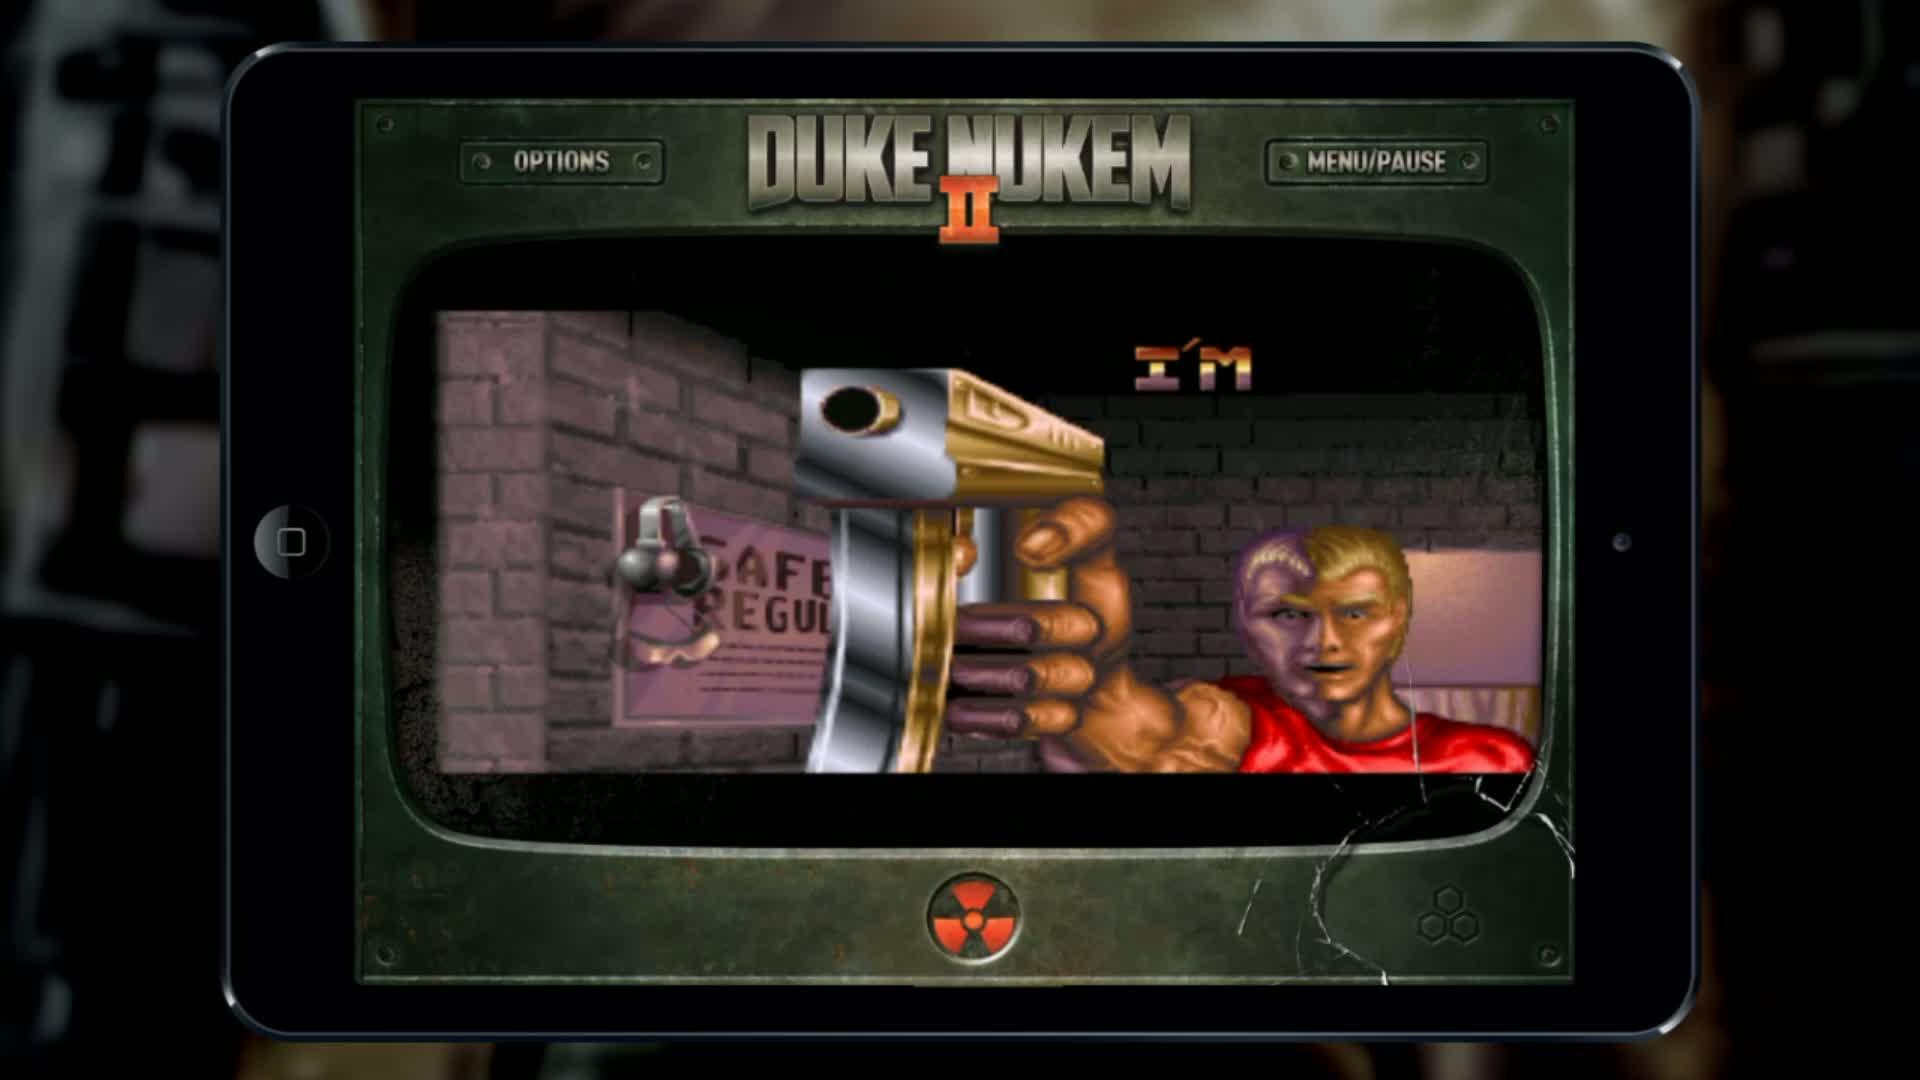 Duke Nukem II  Videos and Trailers